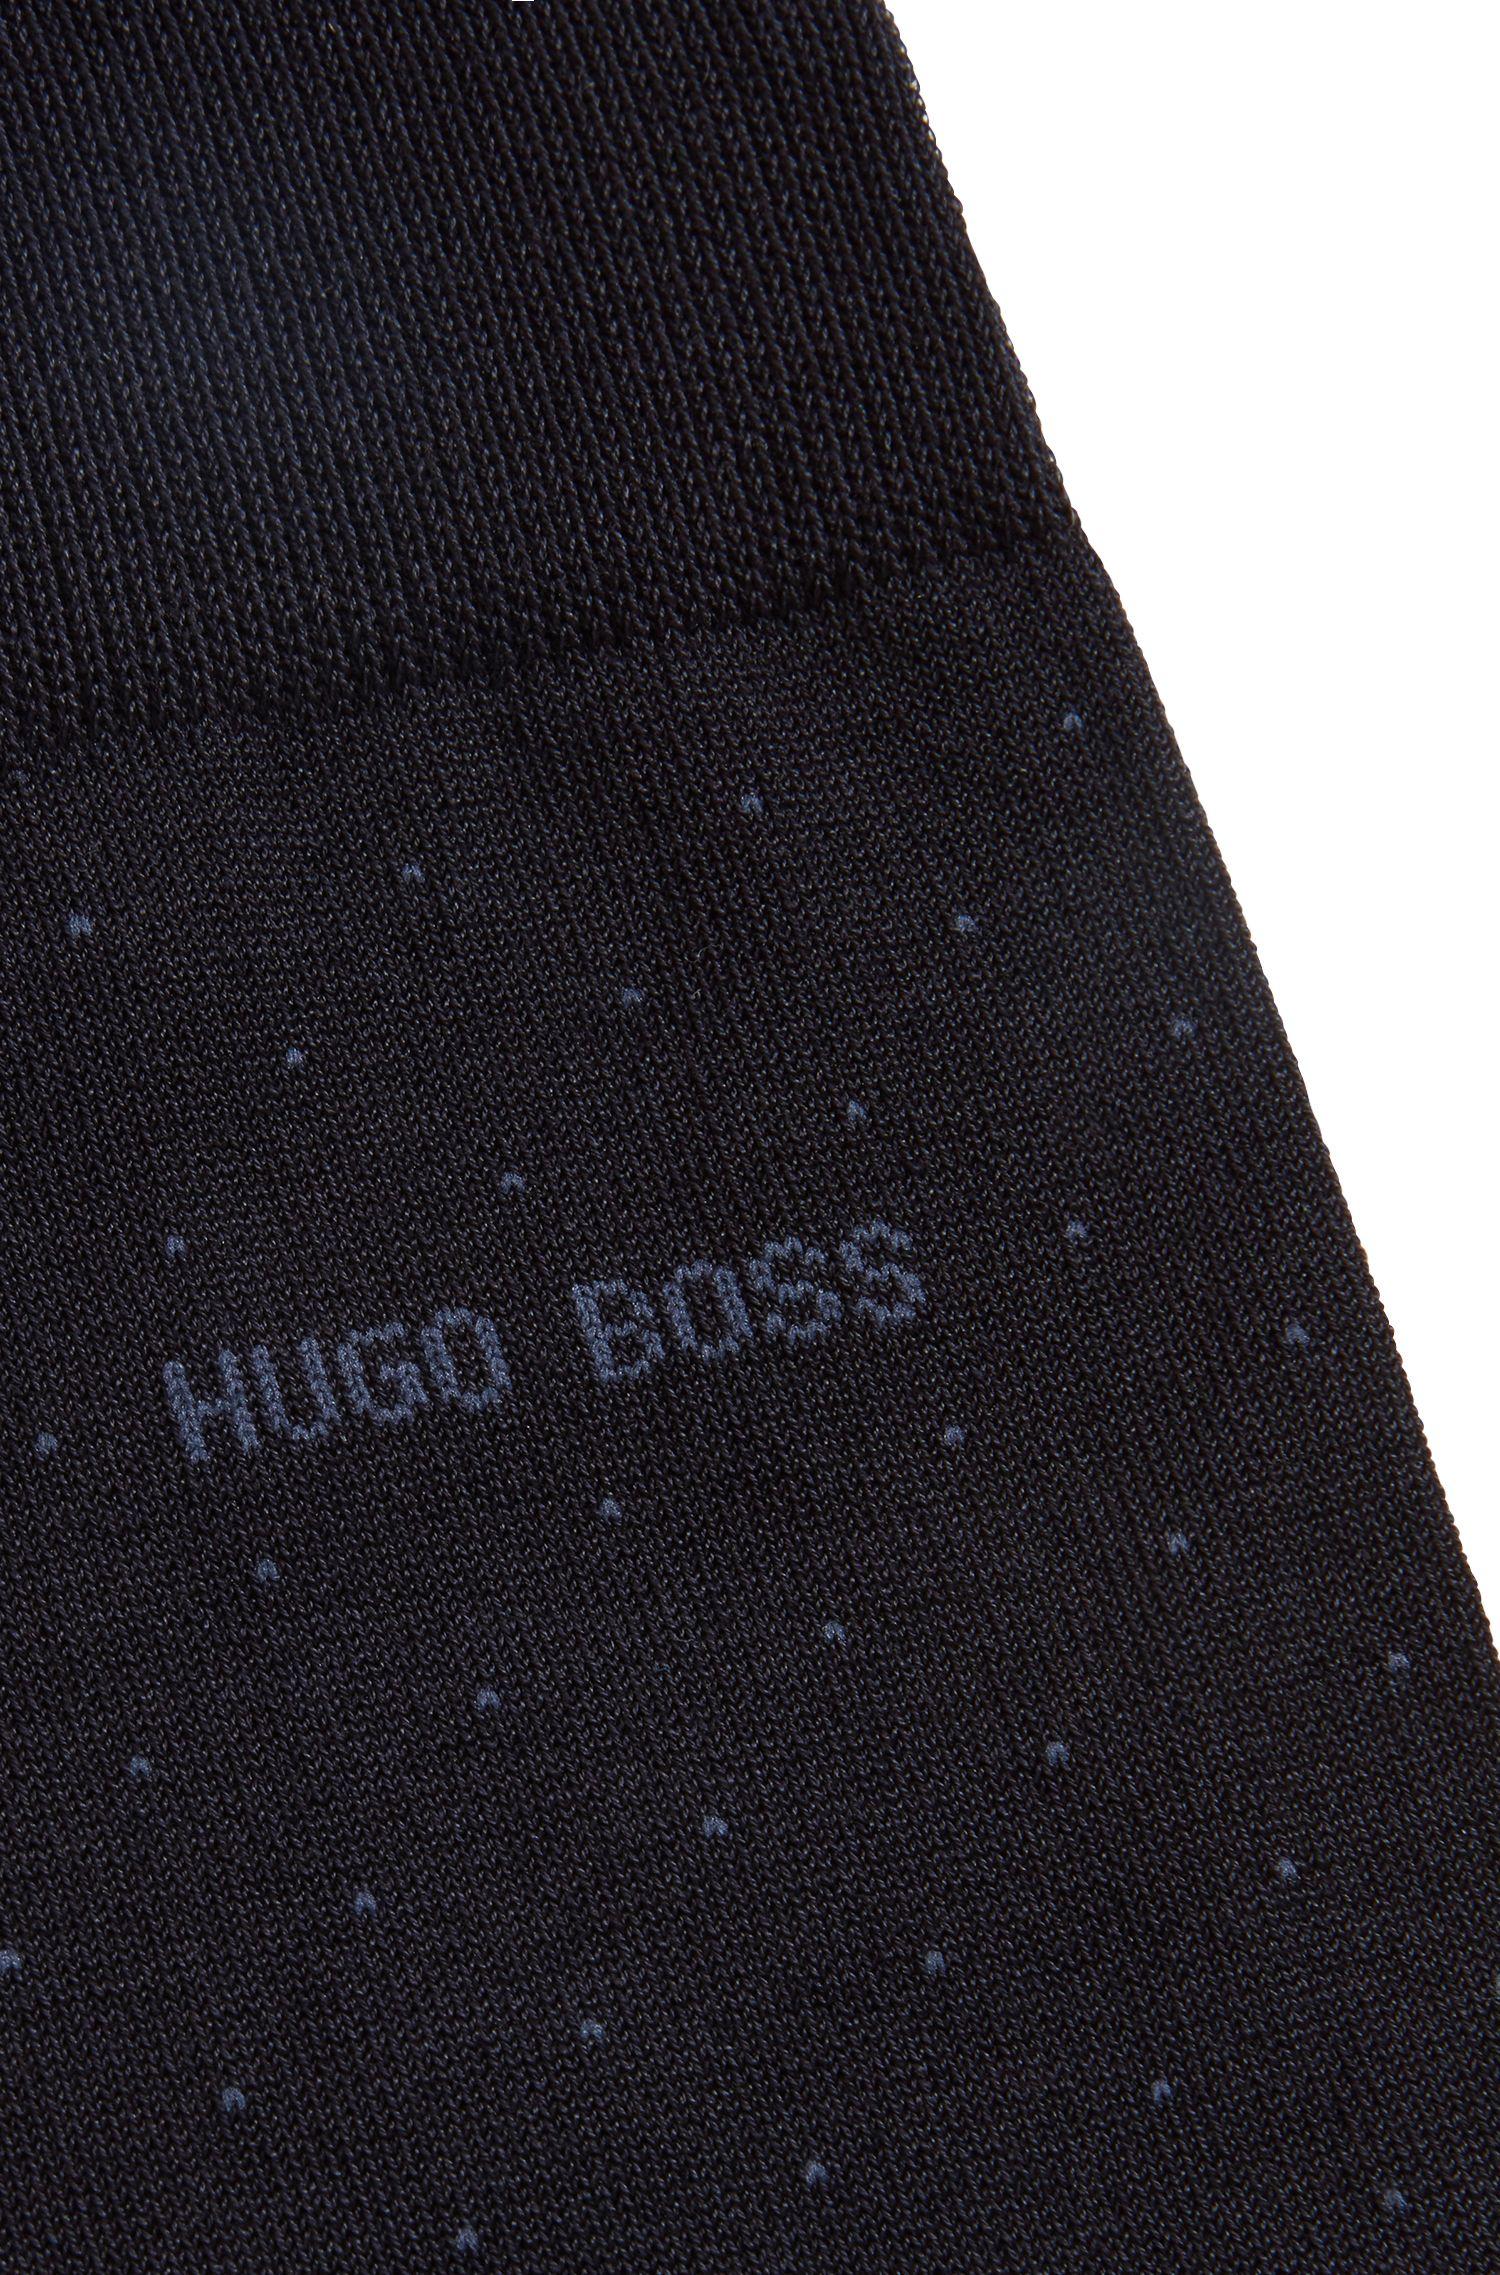 Calcetines de micropuntos en mezcla de algodón mercerizado, Azul oscuro